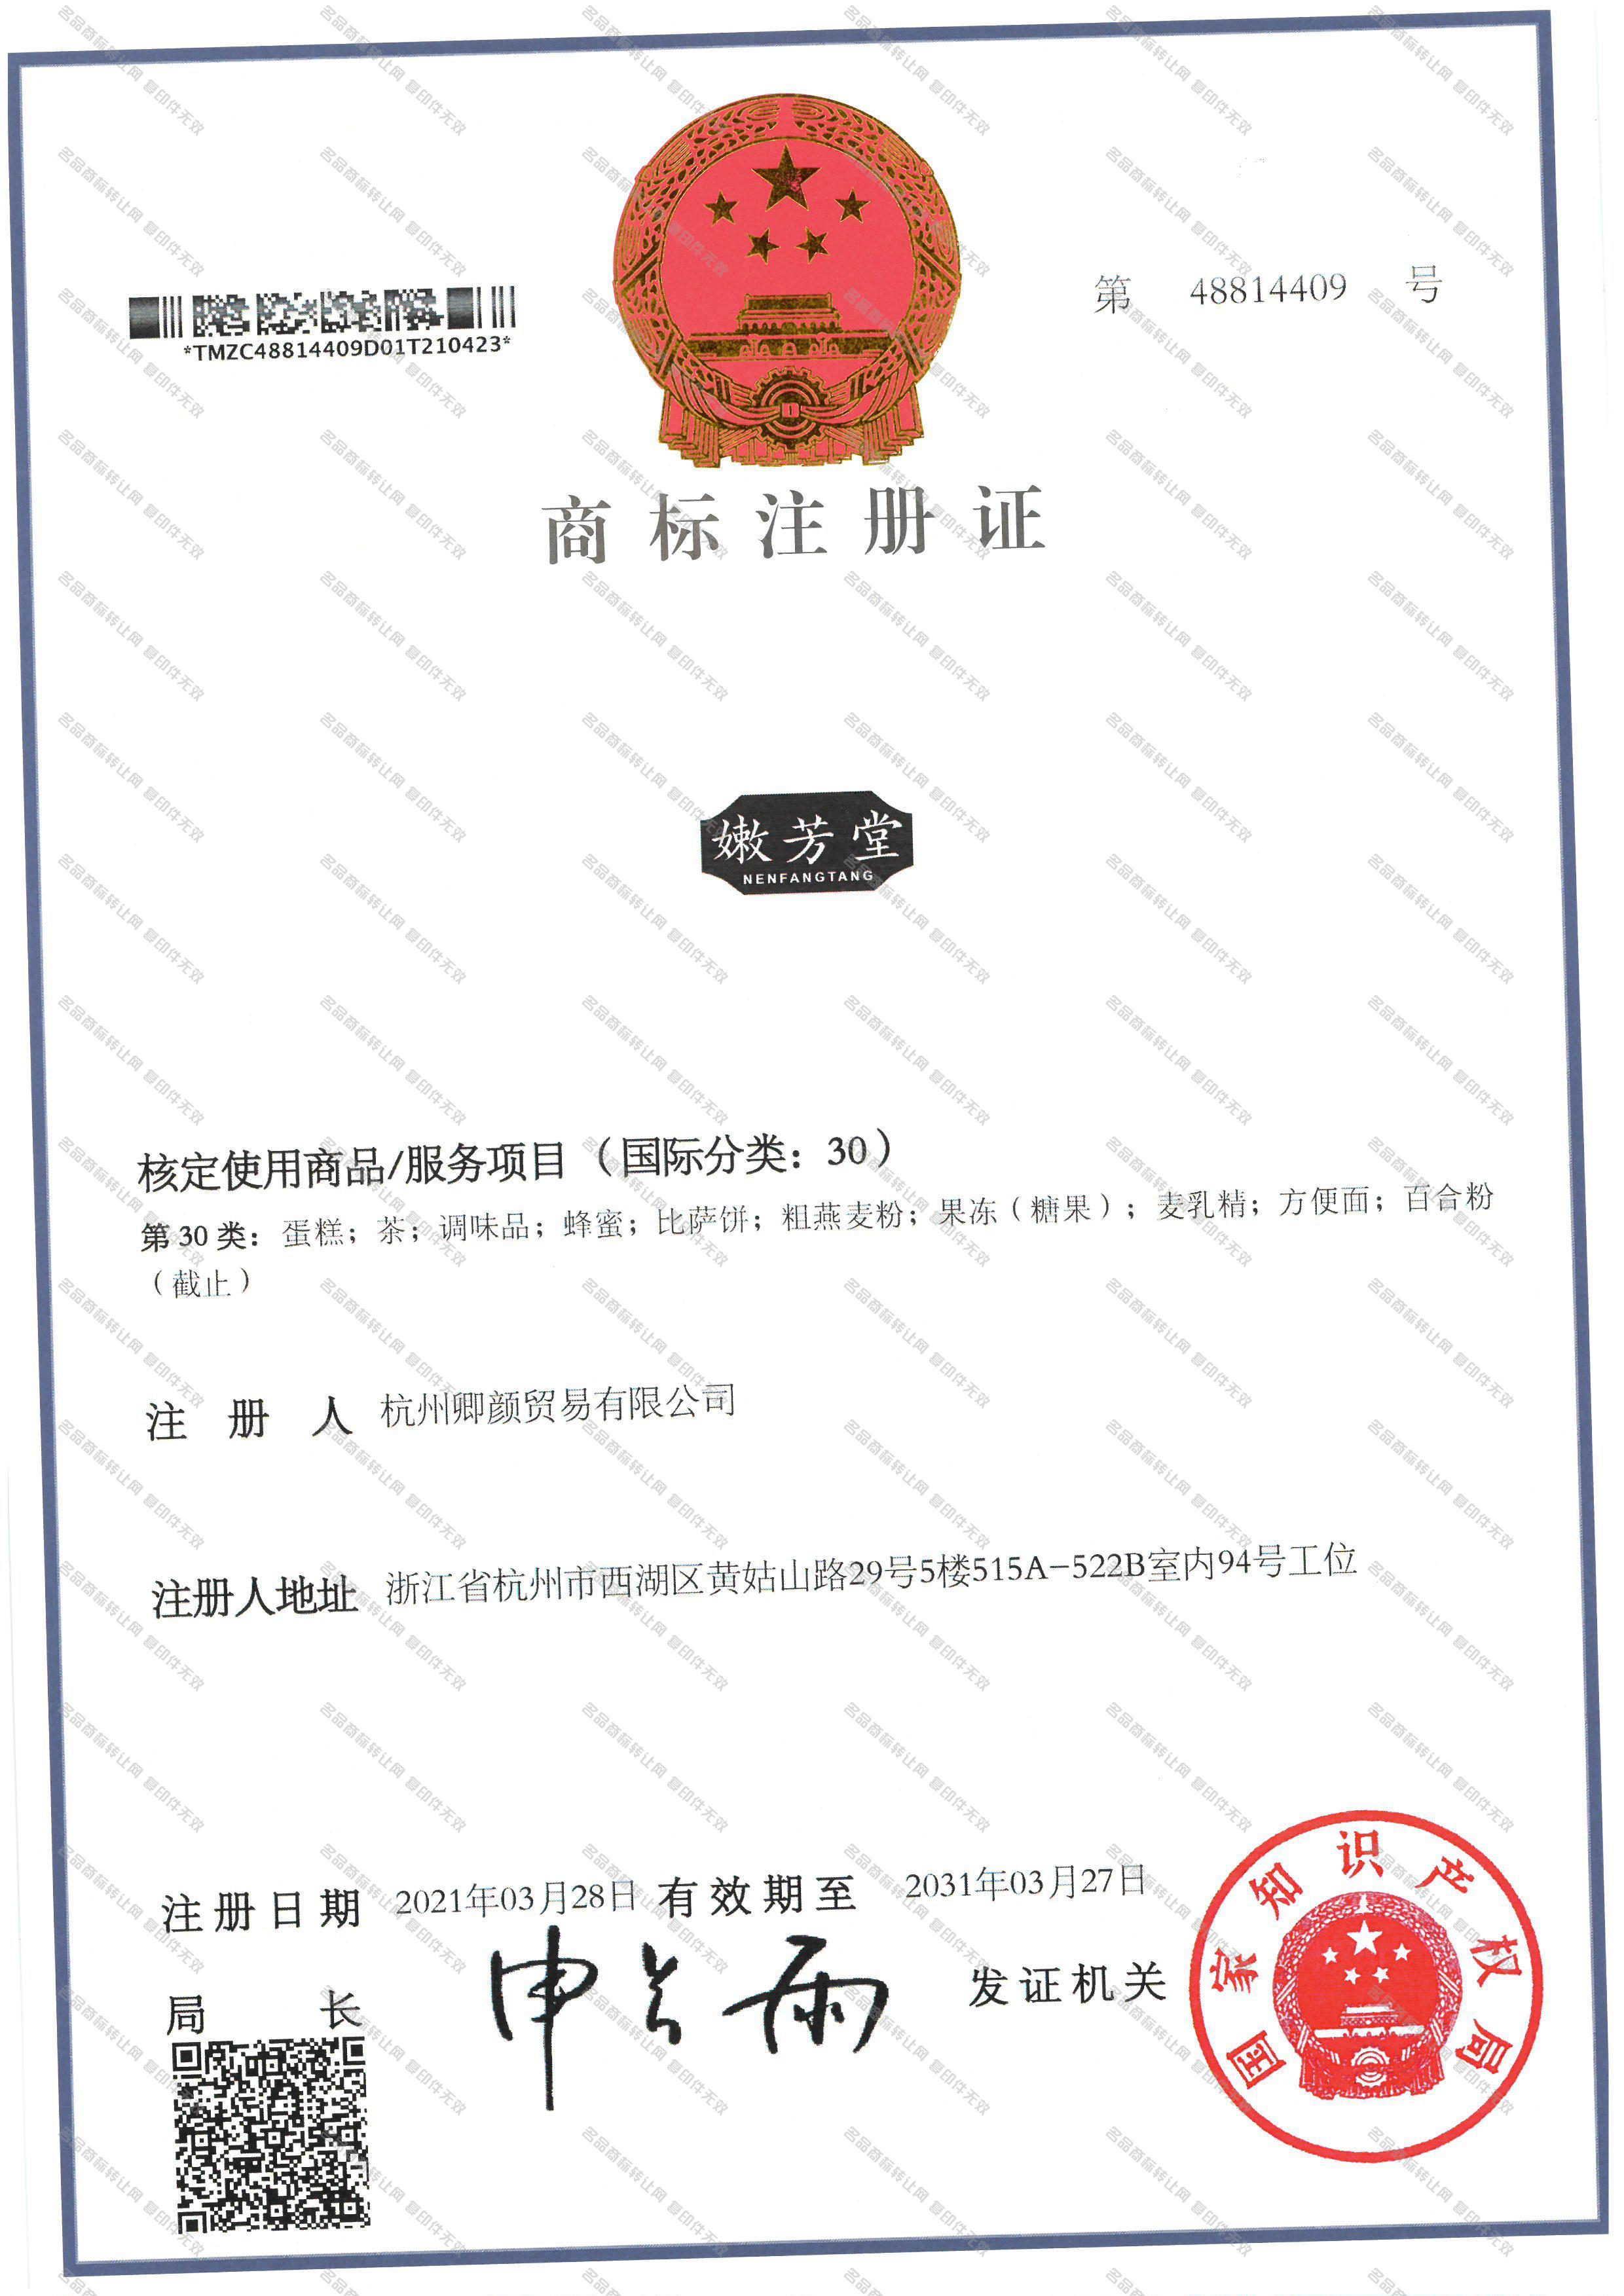 嫩芳堂;NENFANGTANG注册证